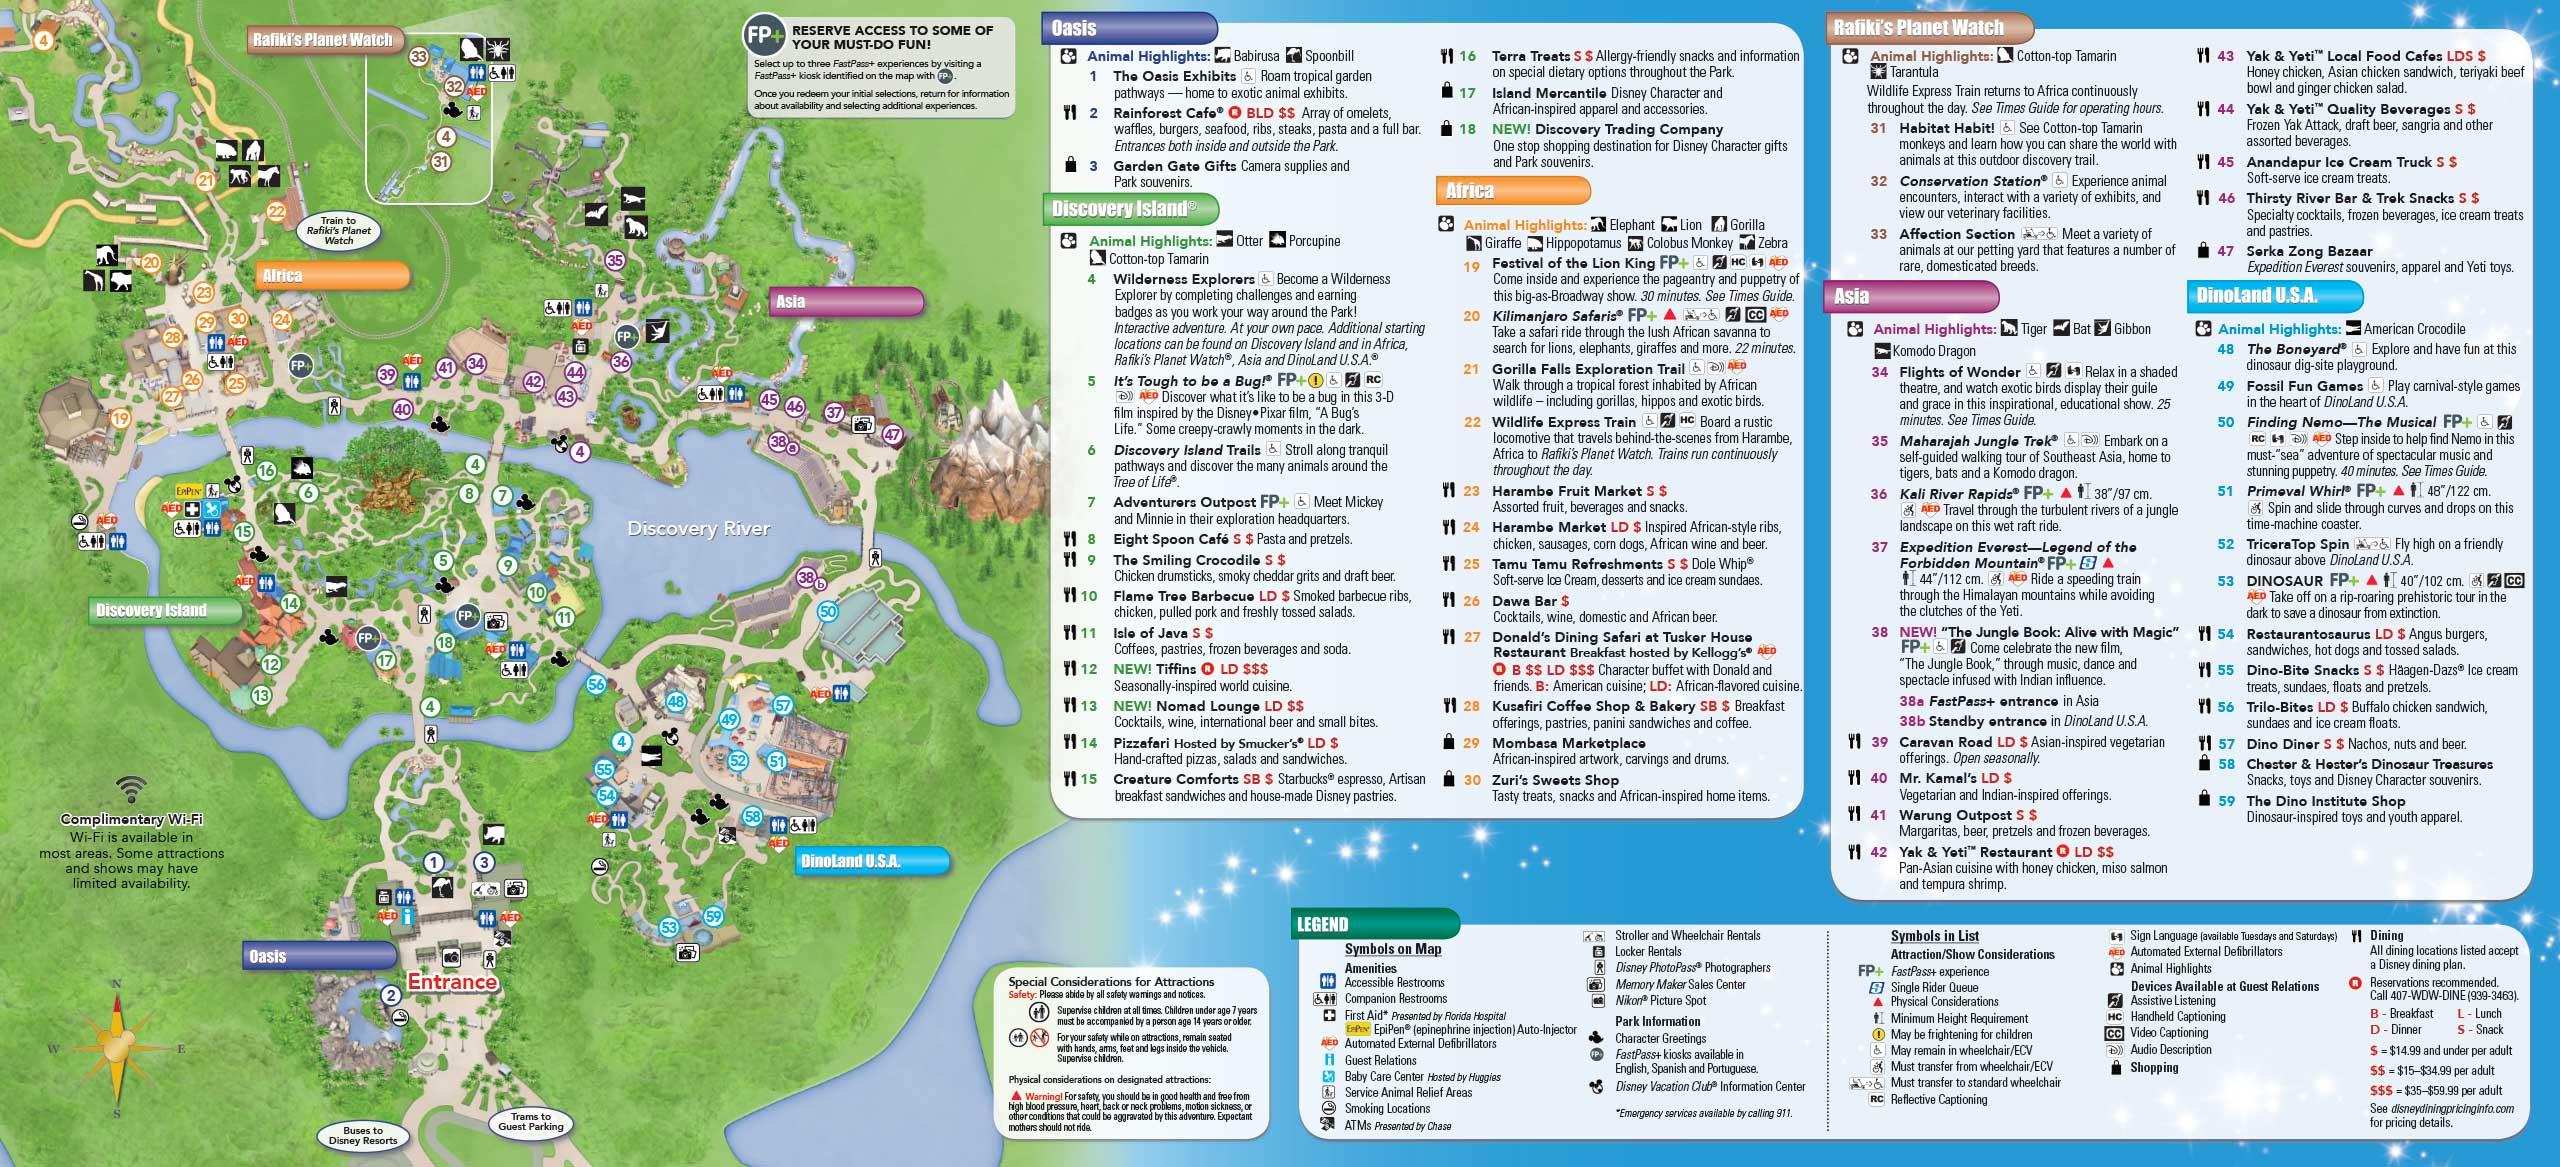 May 2016 Walt Disney World Park Maps - Photo 2 of 14